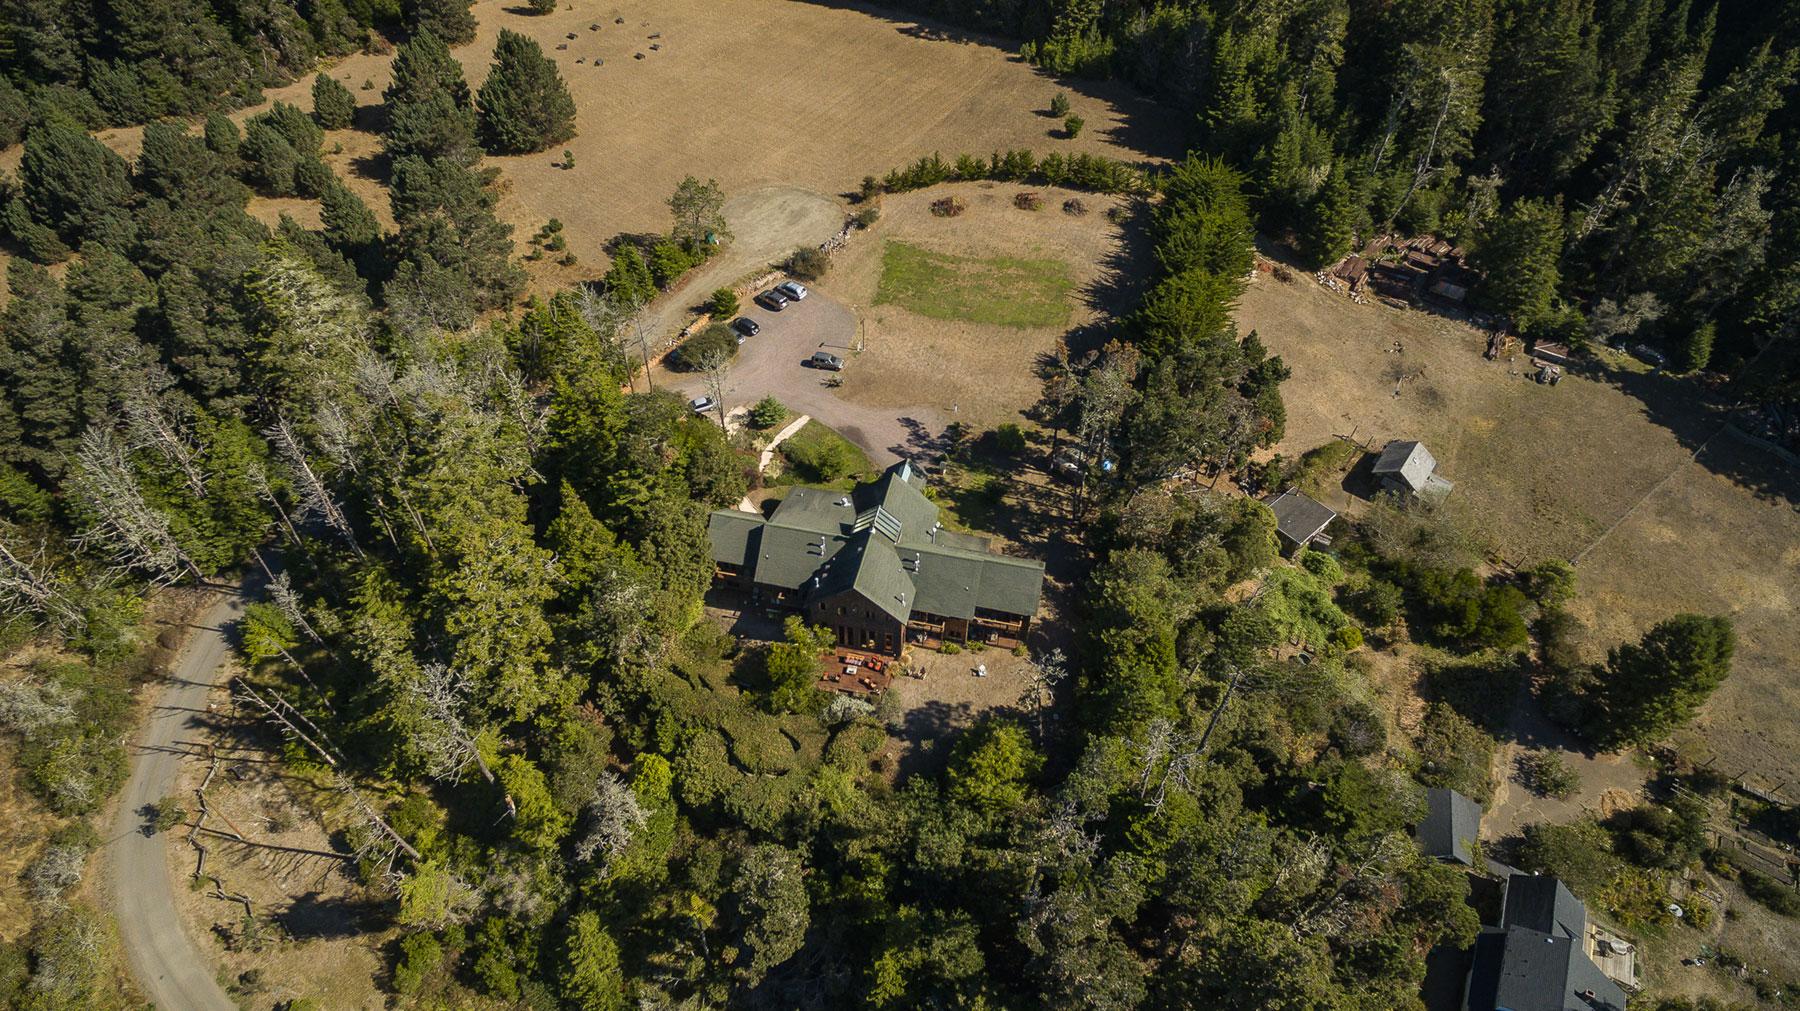 an aerial view of Brewery Gulch Inn south of Mendocino, California